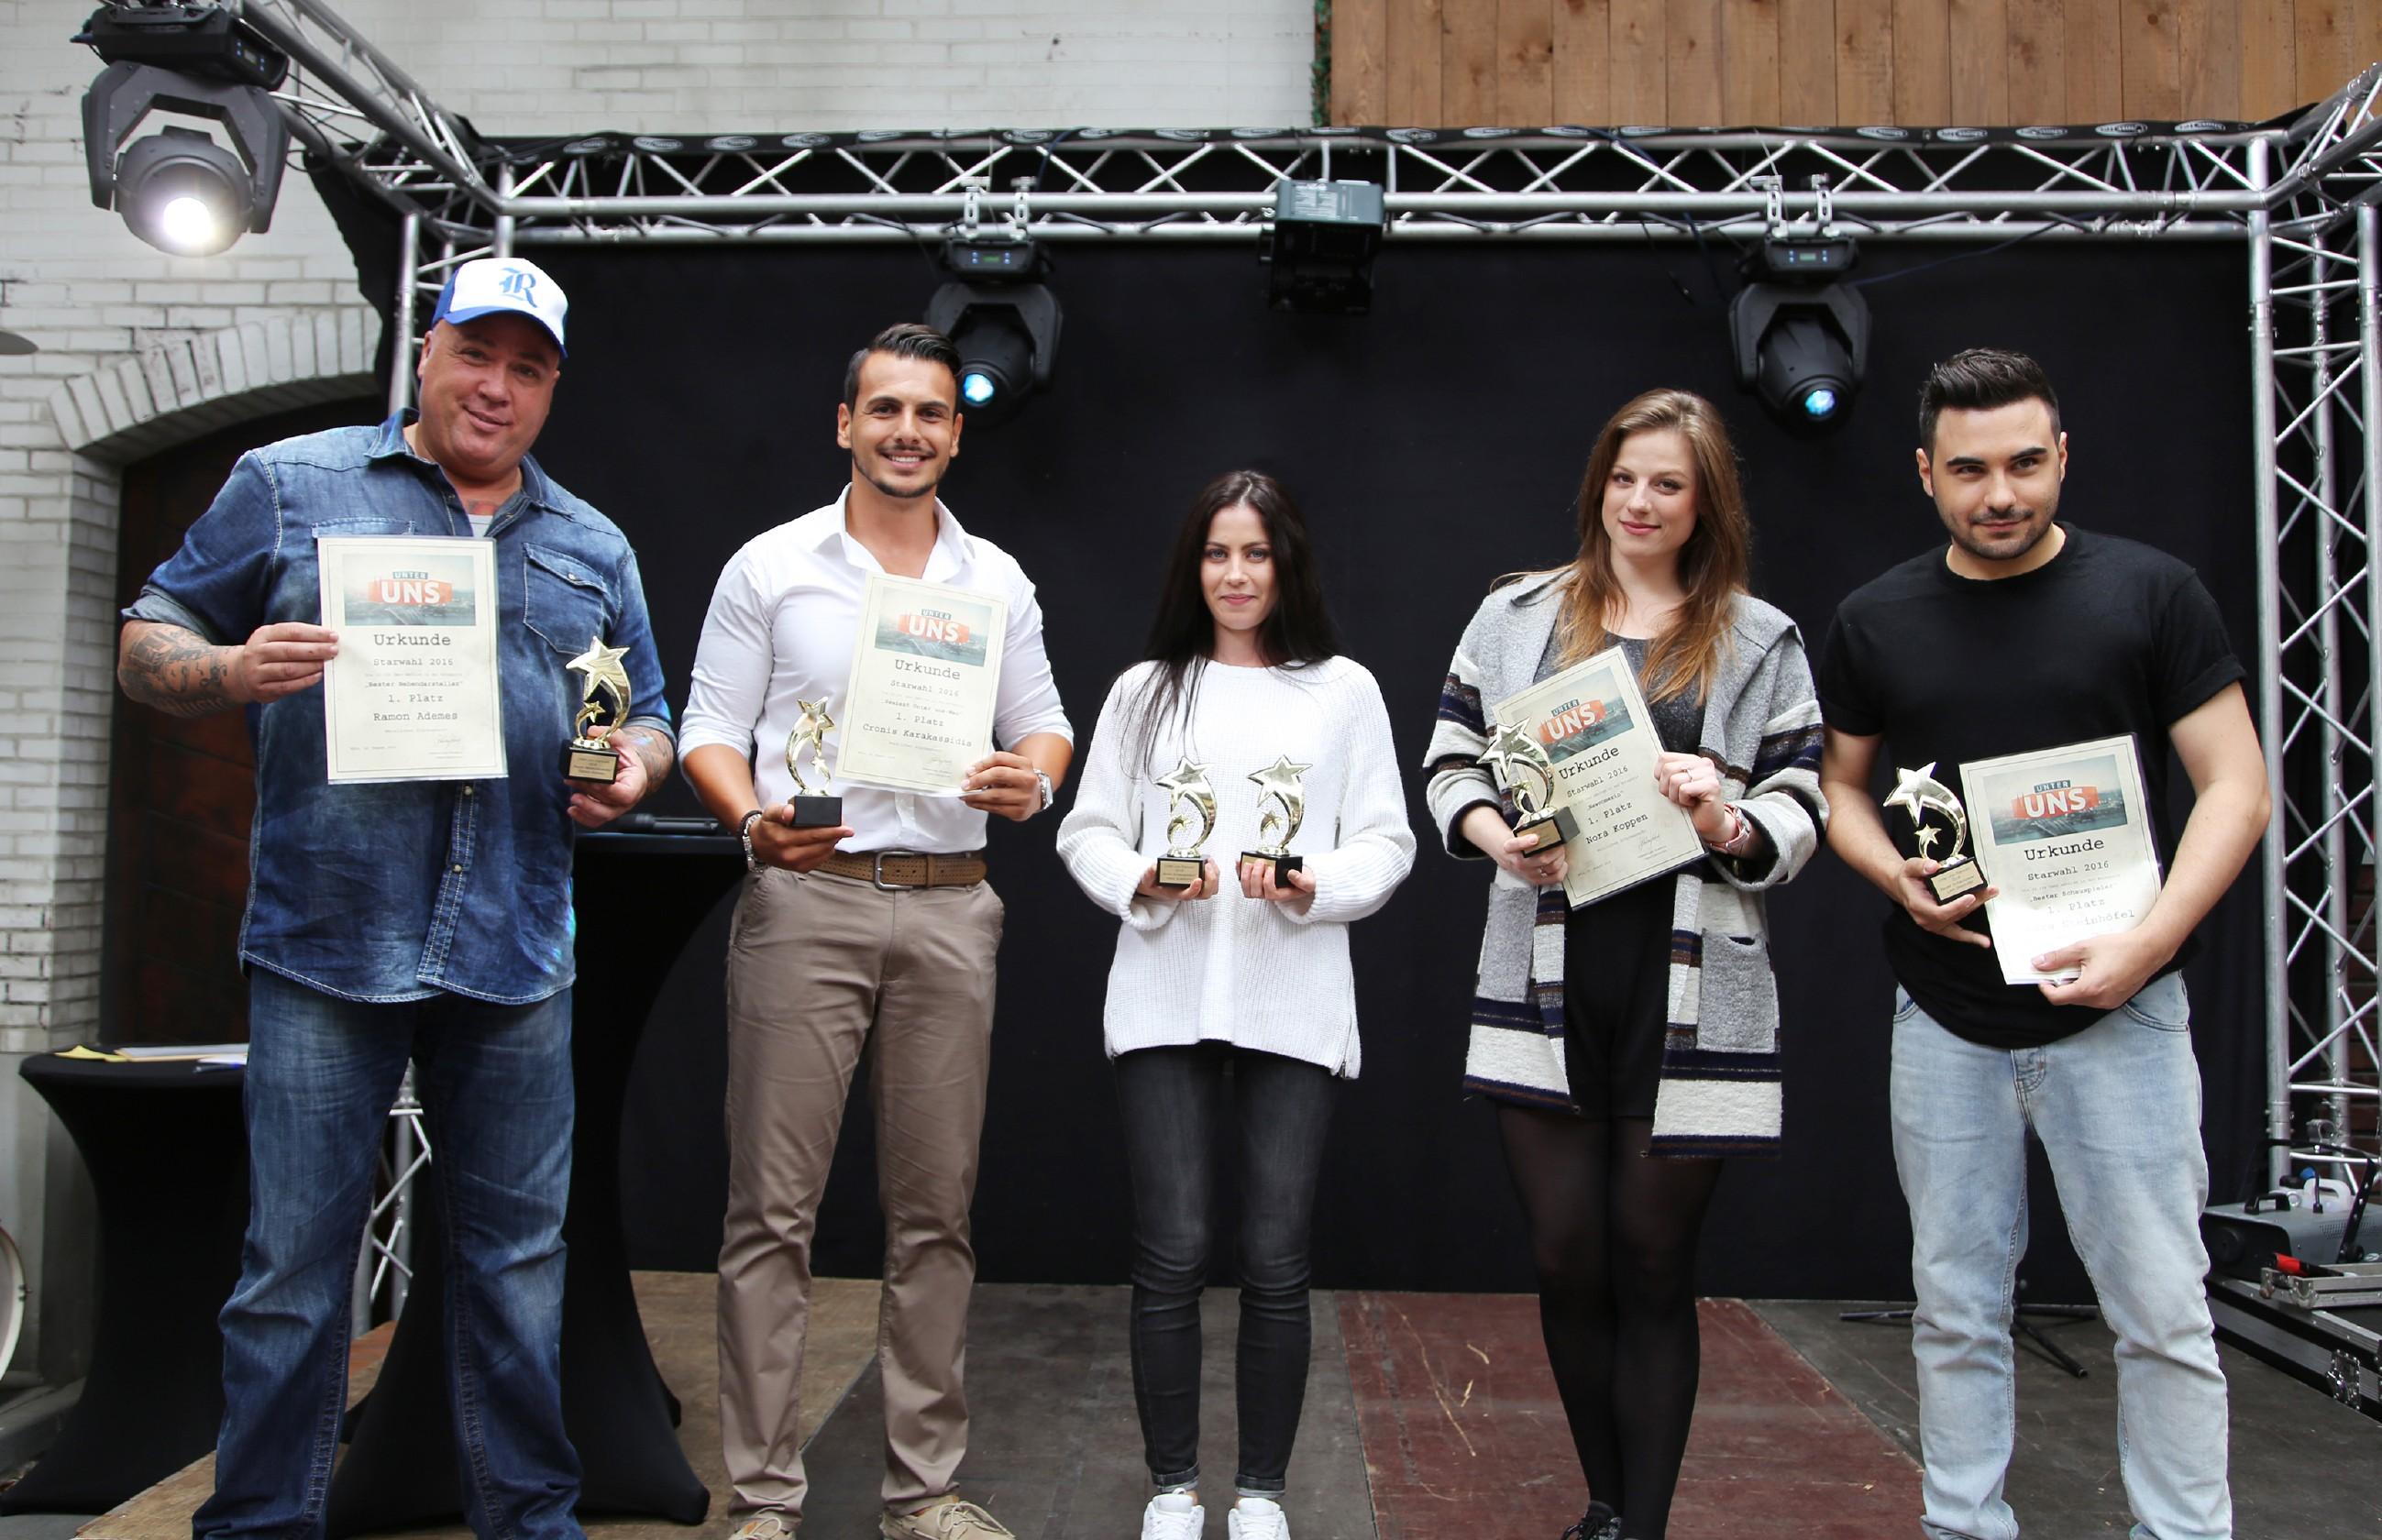 v.l.: Ramon Ademes, Cronis Karakassidis, Valea Katharina Scalabrino, Nora Koppen und Lars Steinhöfel